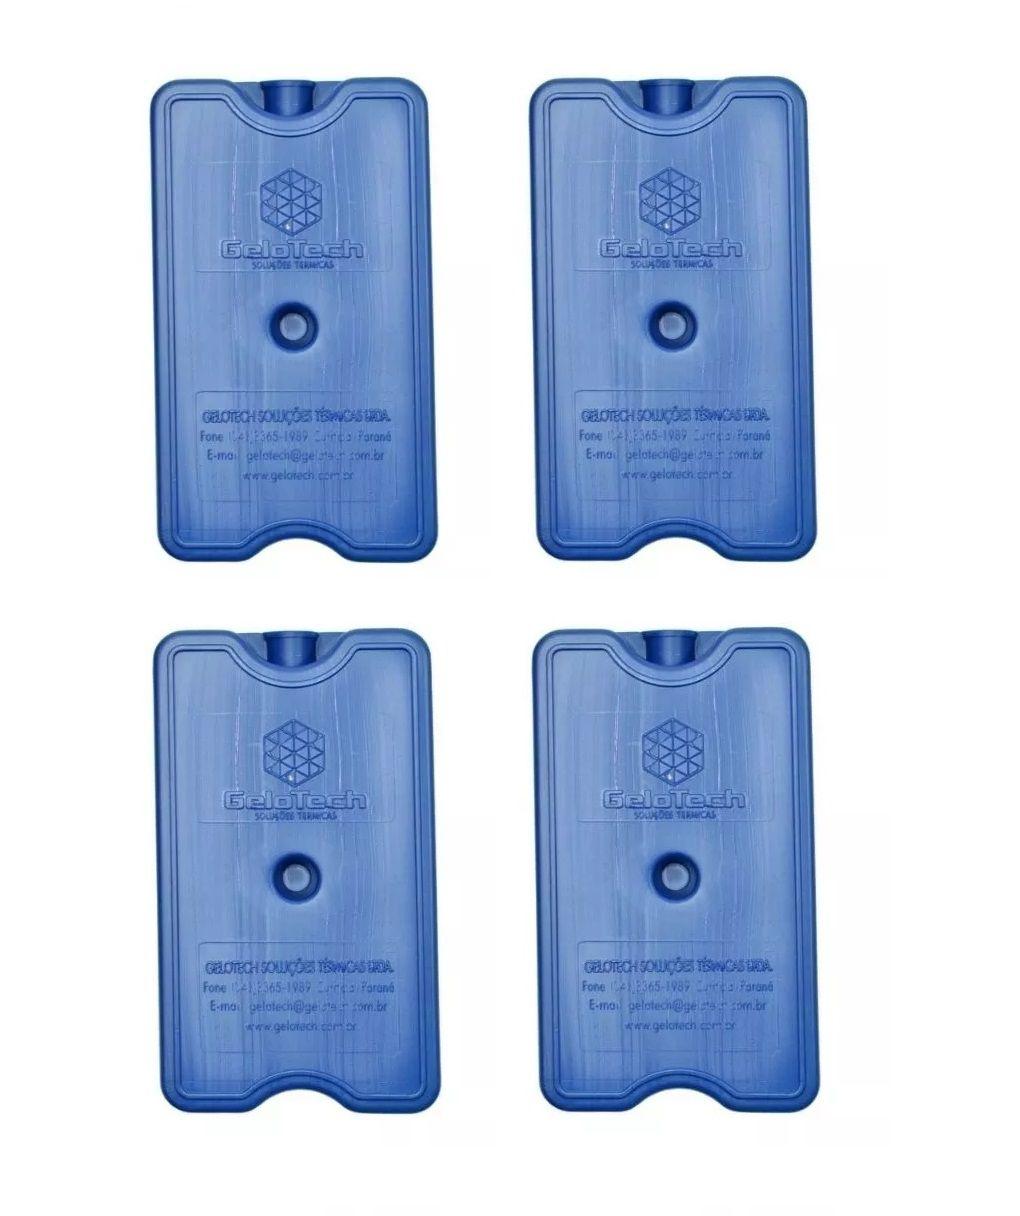 Placa Gelo-x Gel Rígido Reutilizável 500ml 17x10x3cm Gelotech Kit c/ 4 unidades  - Mix Eletro